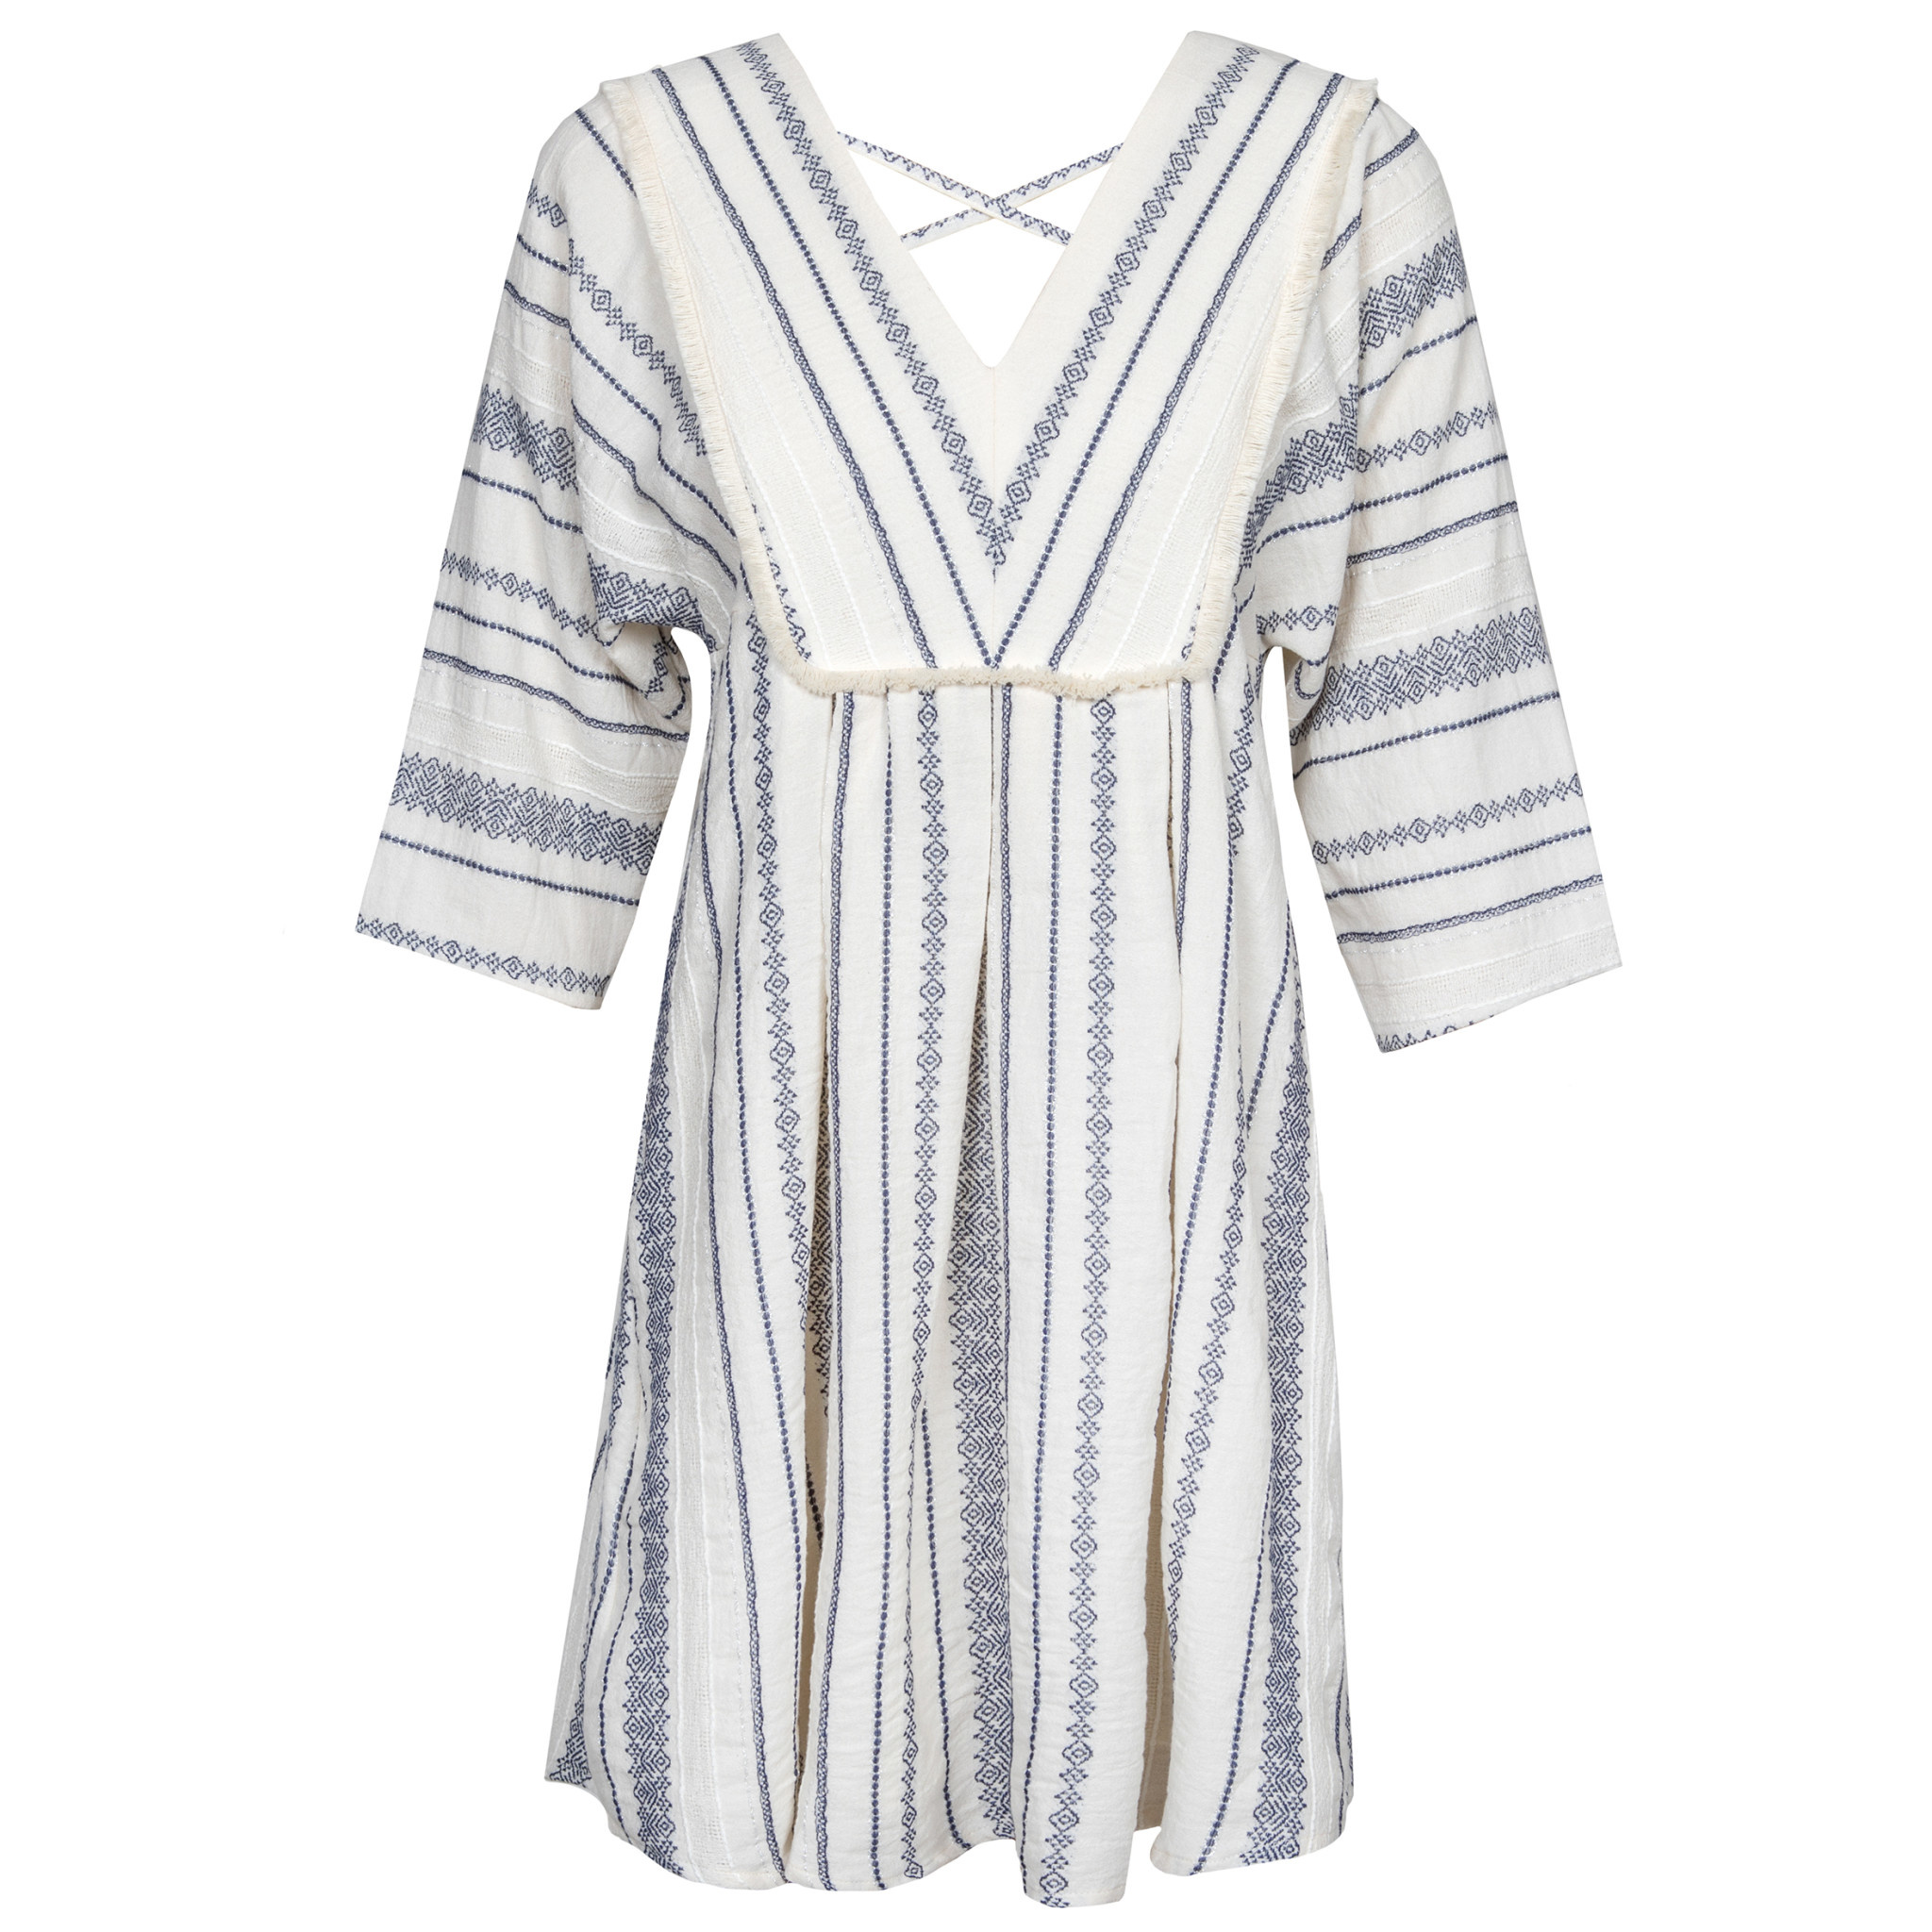 Dress Would